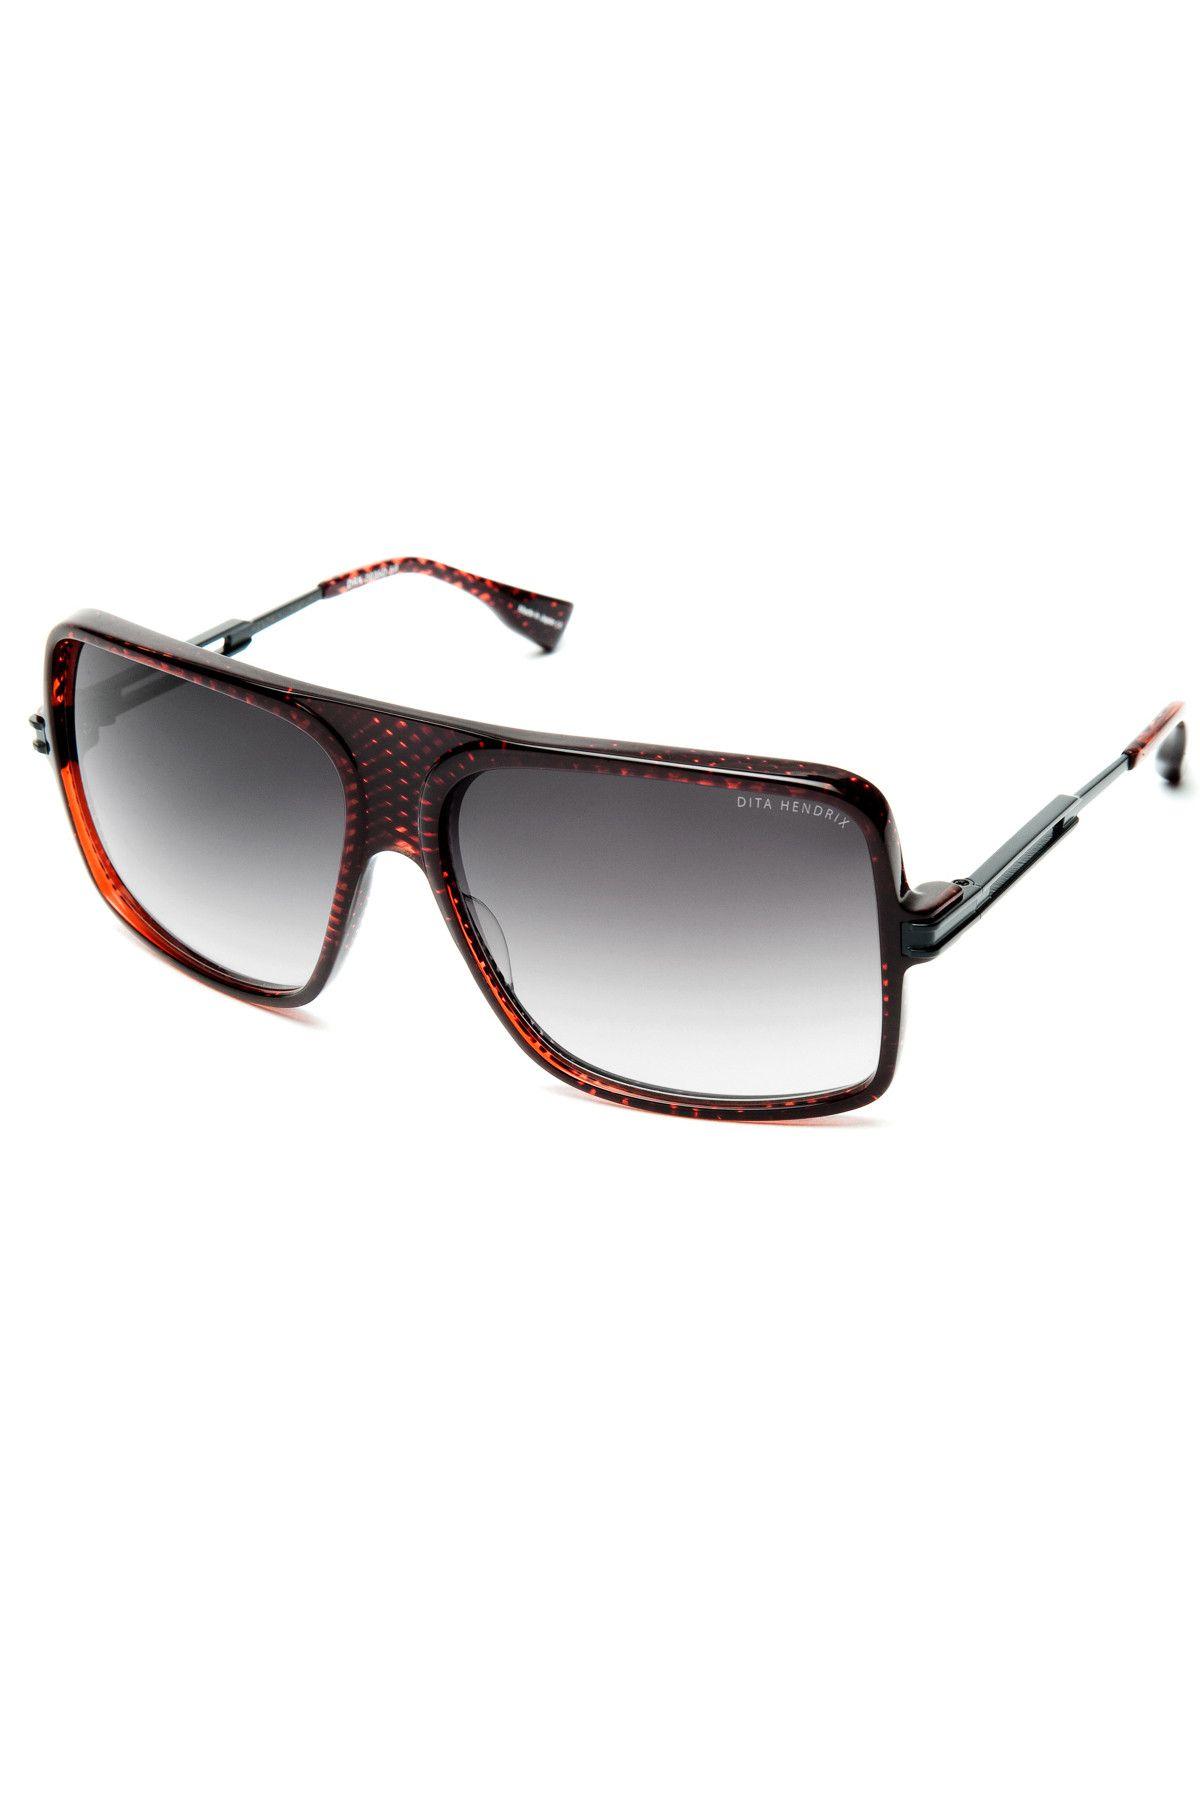 Dita Hendrix DRX-2035D Sunglasses